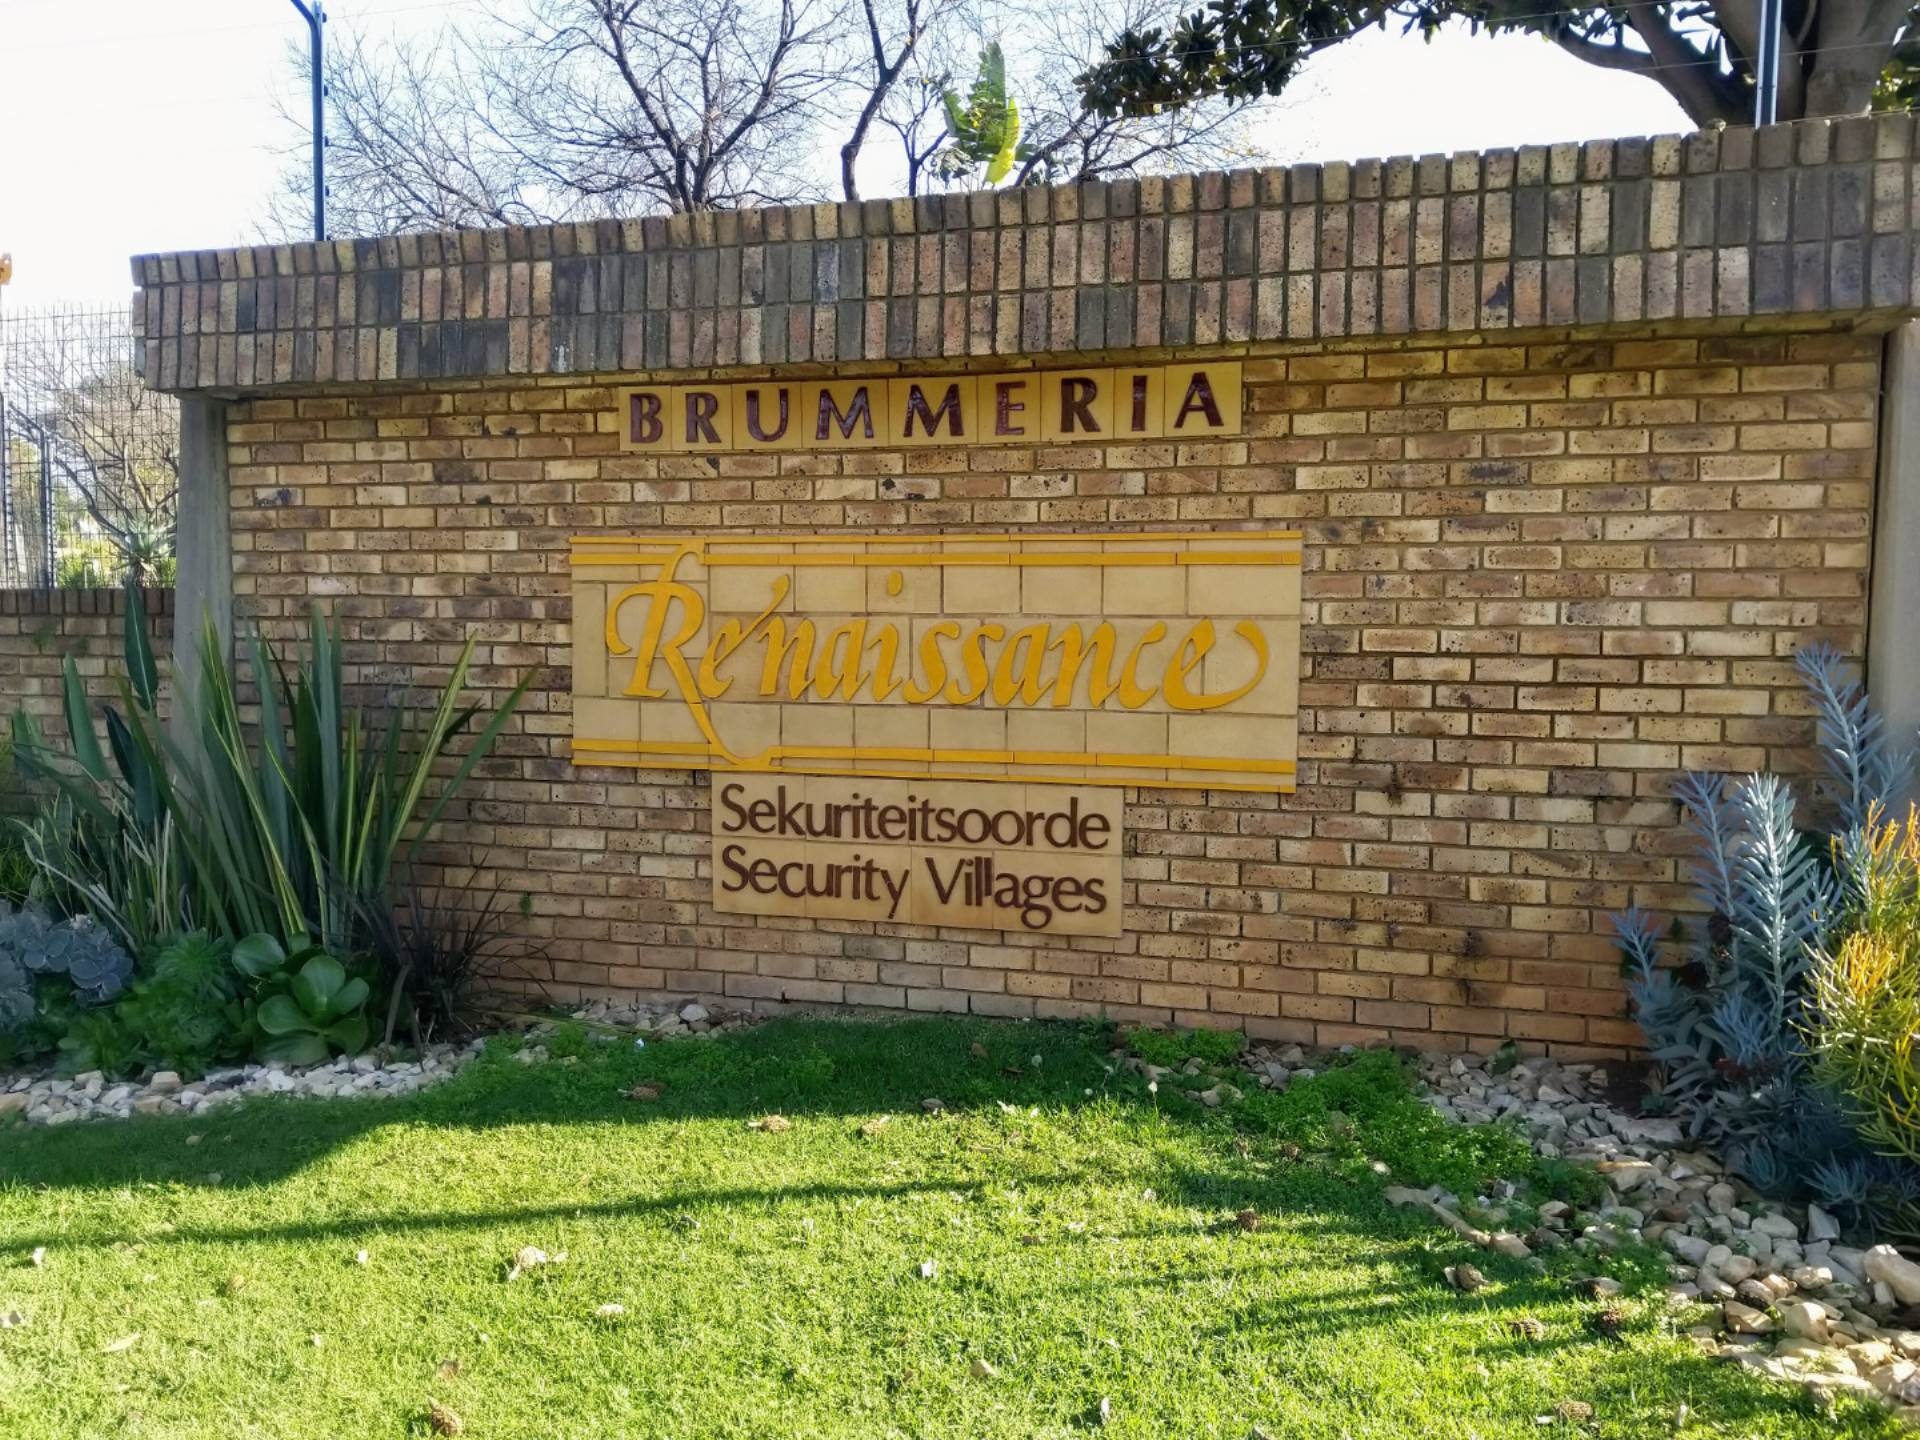 Retirement Village For Sale In Brummeria, Pretoria, Gauteng